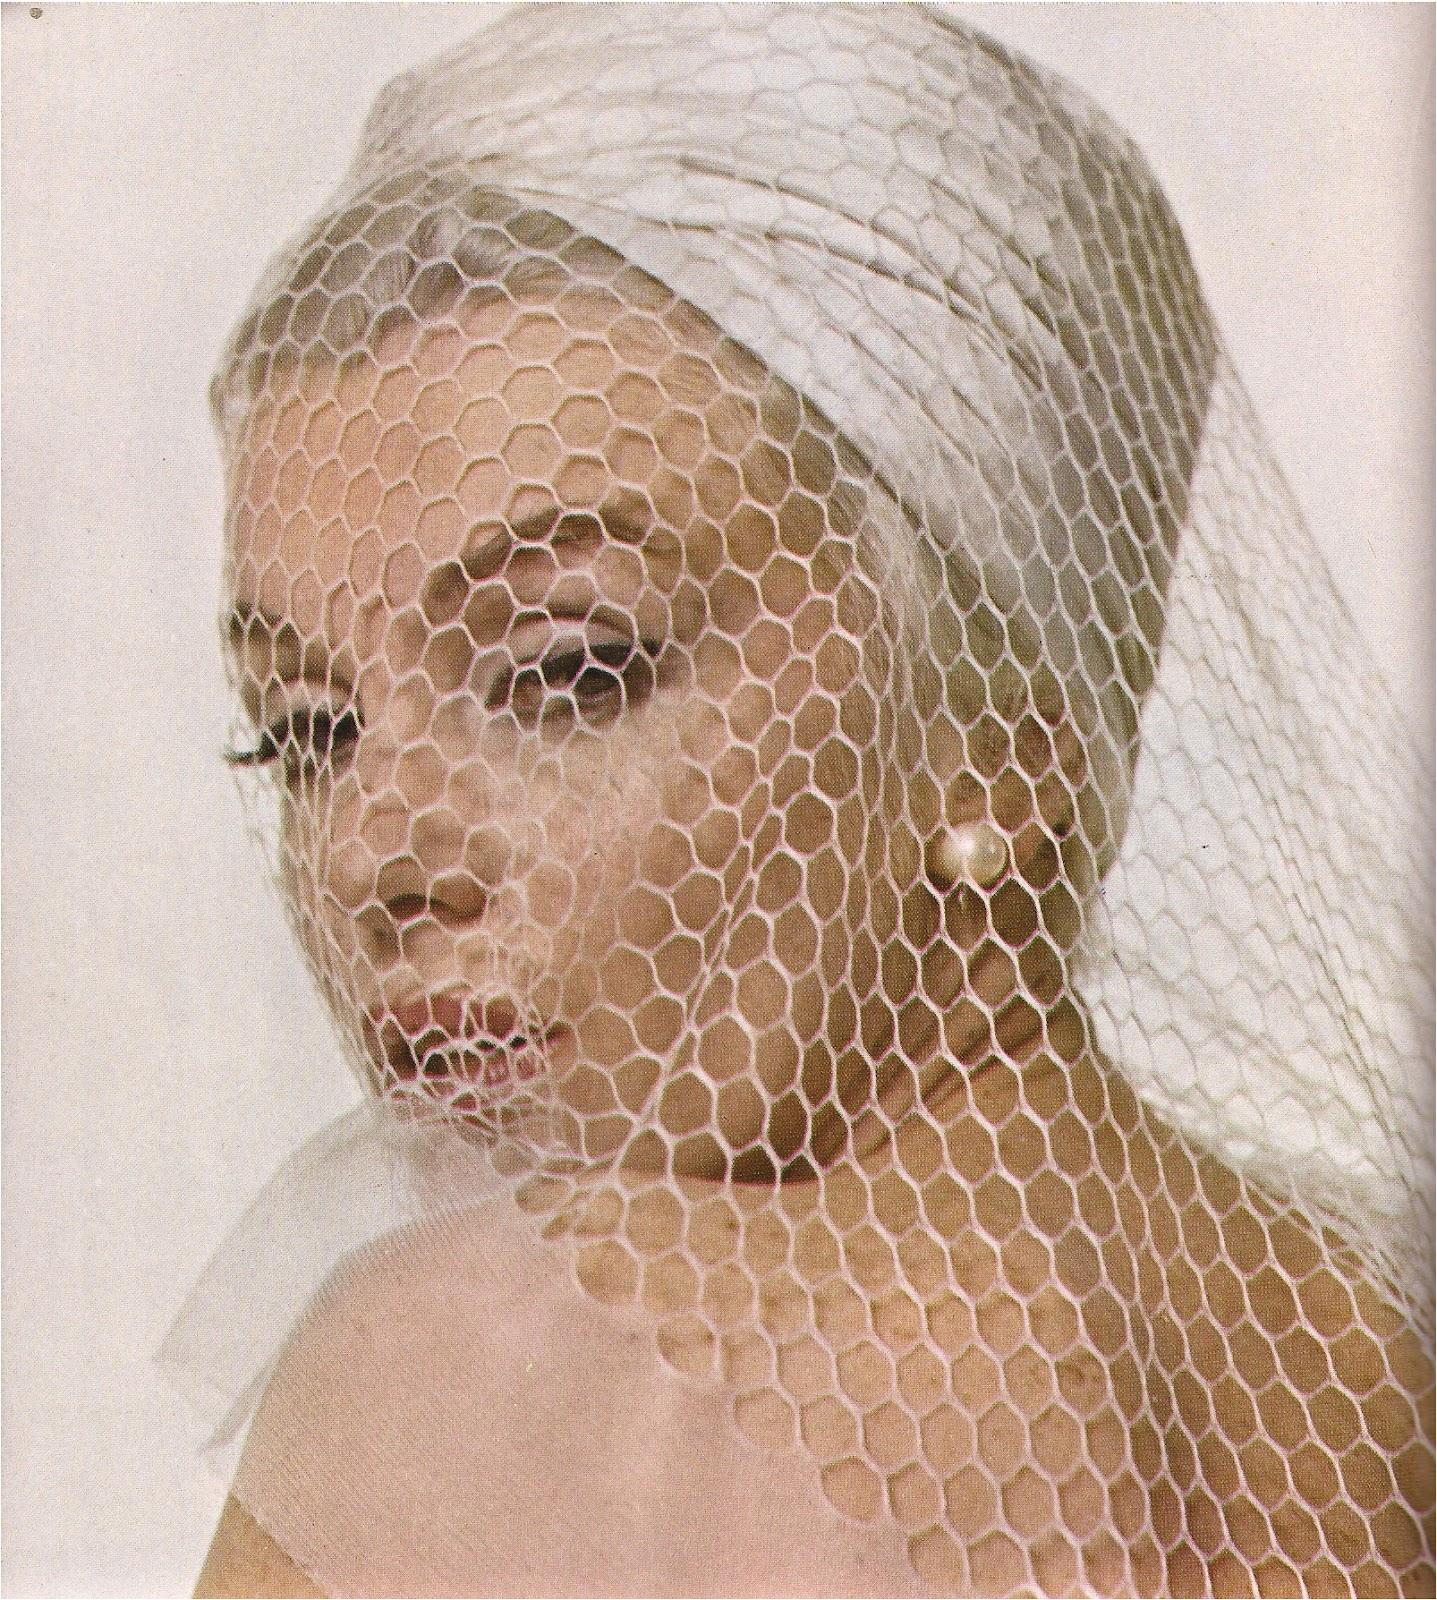 http://3.bp.blogspot.com/-WFmR7J9qGwA/T670TuTe6MI/AAAAAAAAGNQ/ngtgqflCEVk/s1600/Marilyn+Monroe+Show+Magazine+9%253A72-5.jpg